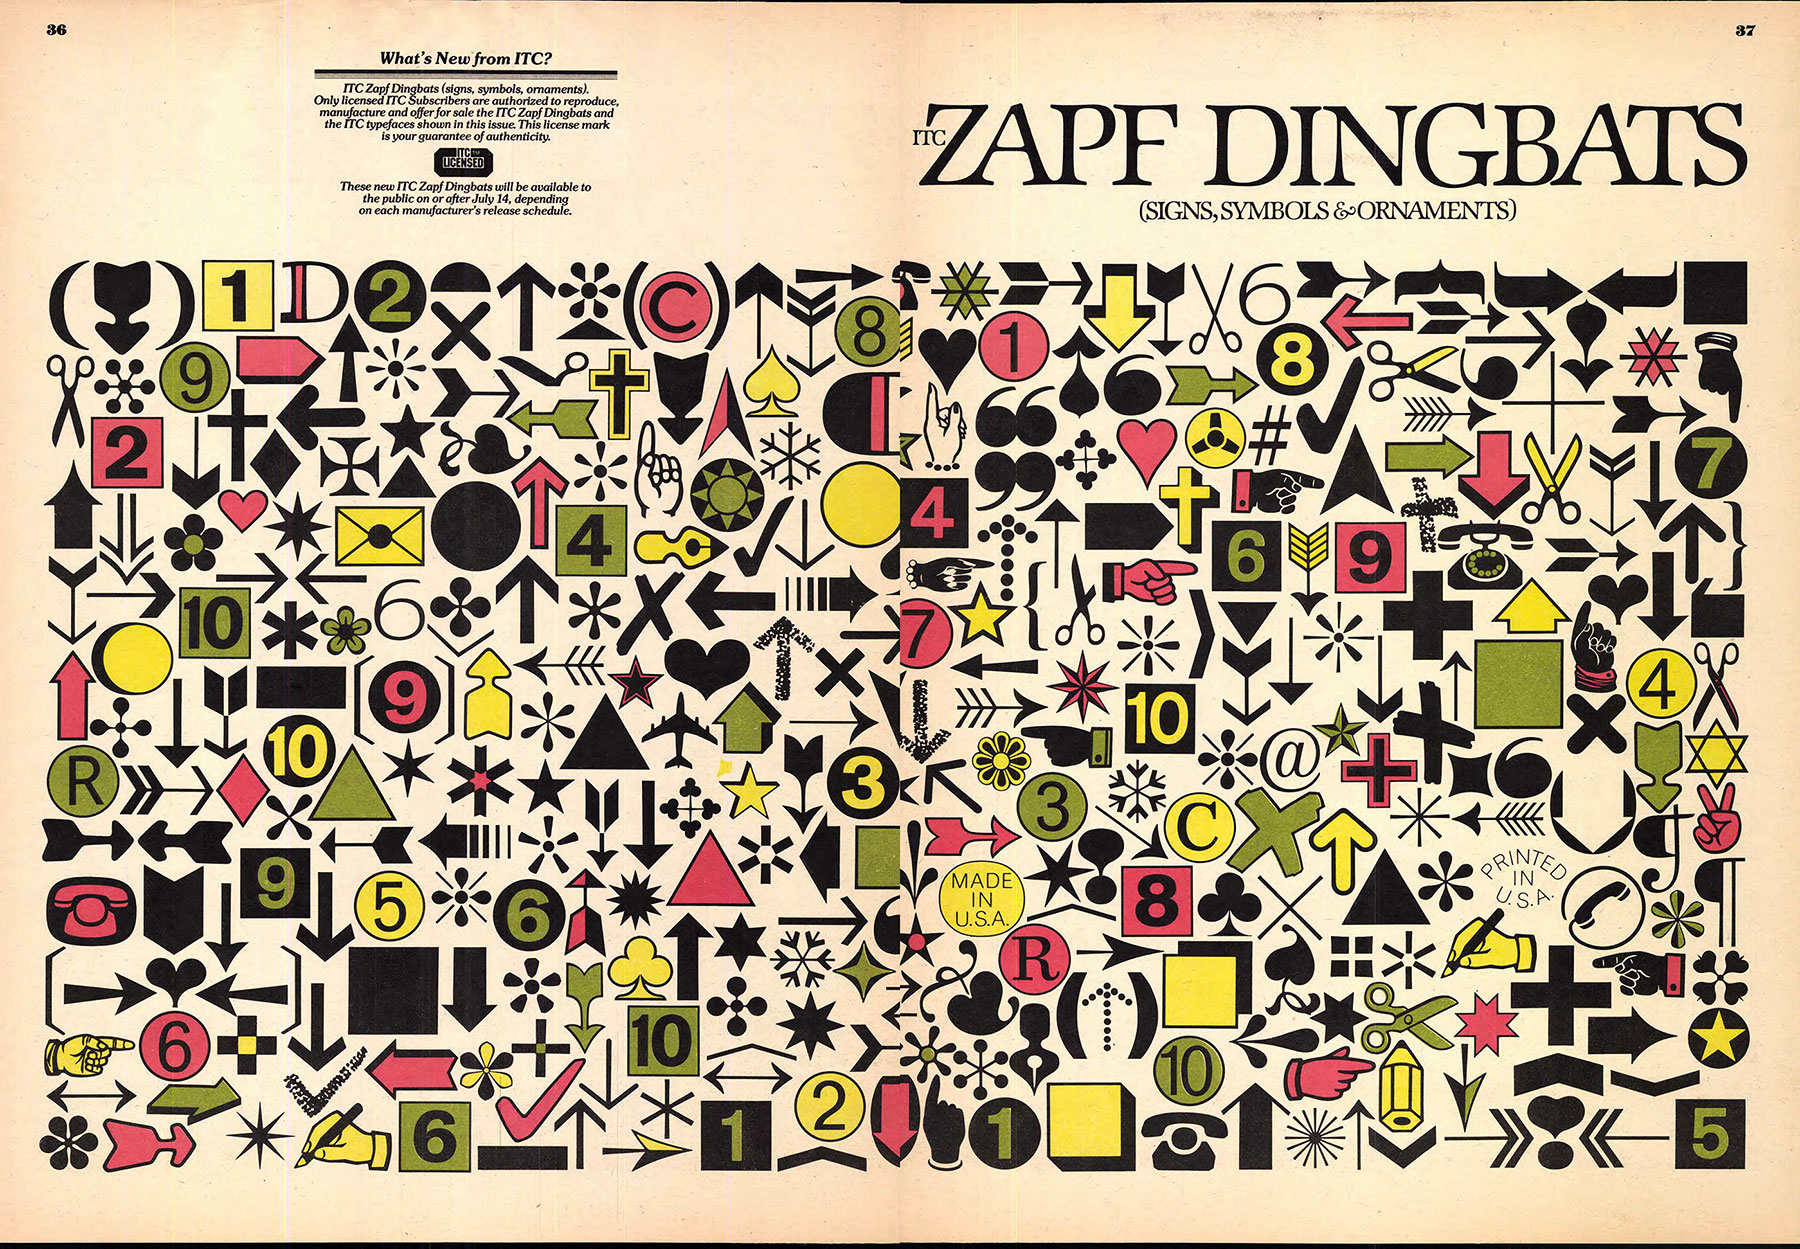 Hermann-Zapf-itc-dingbats-01